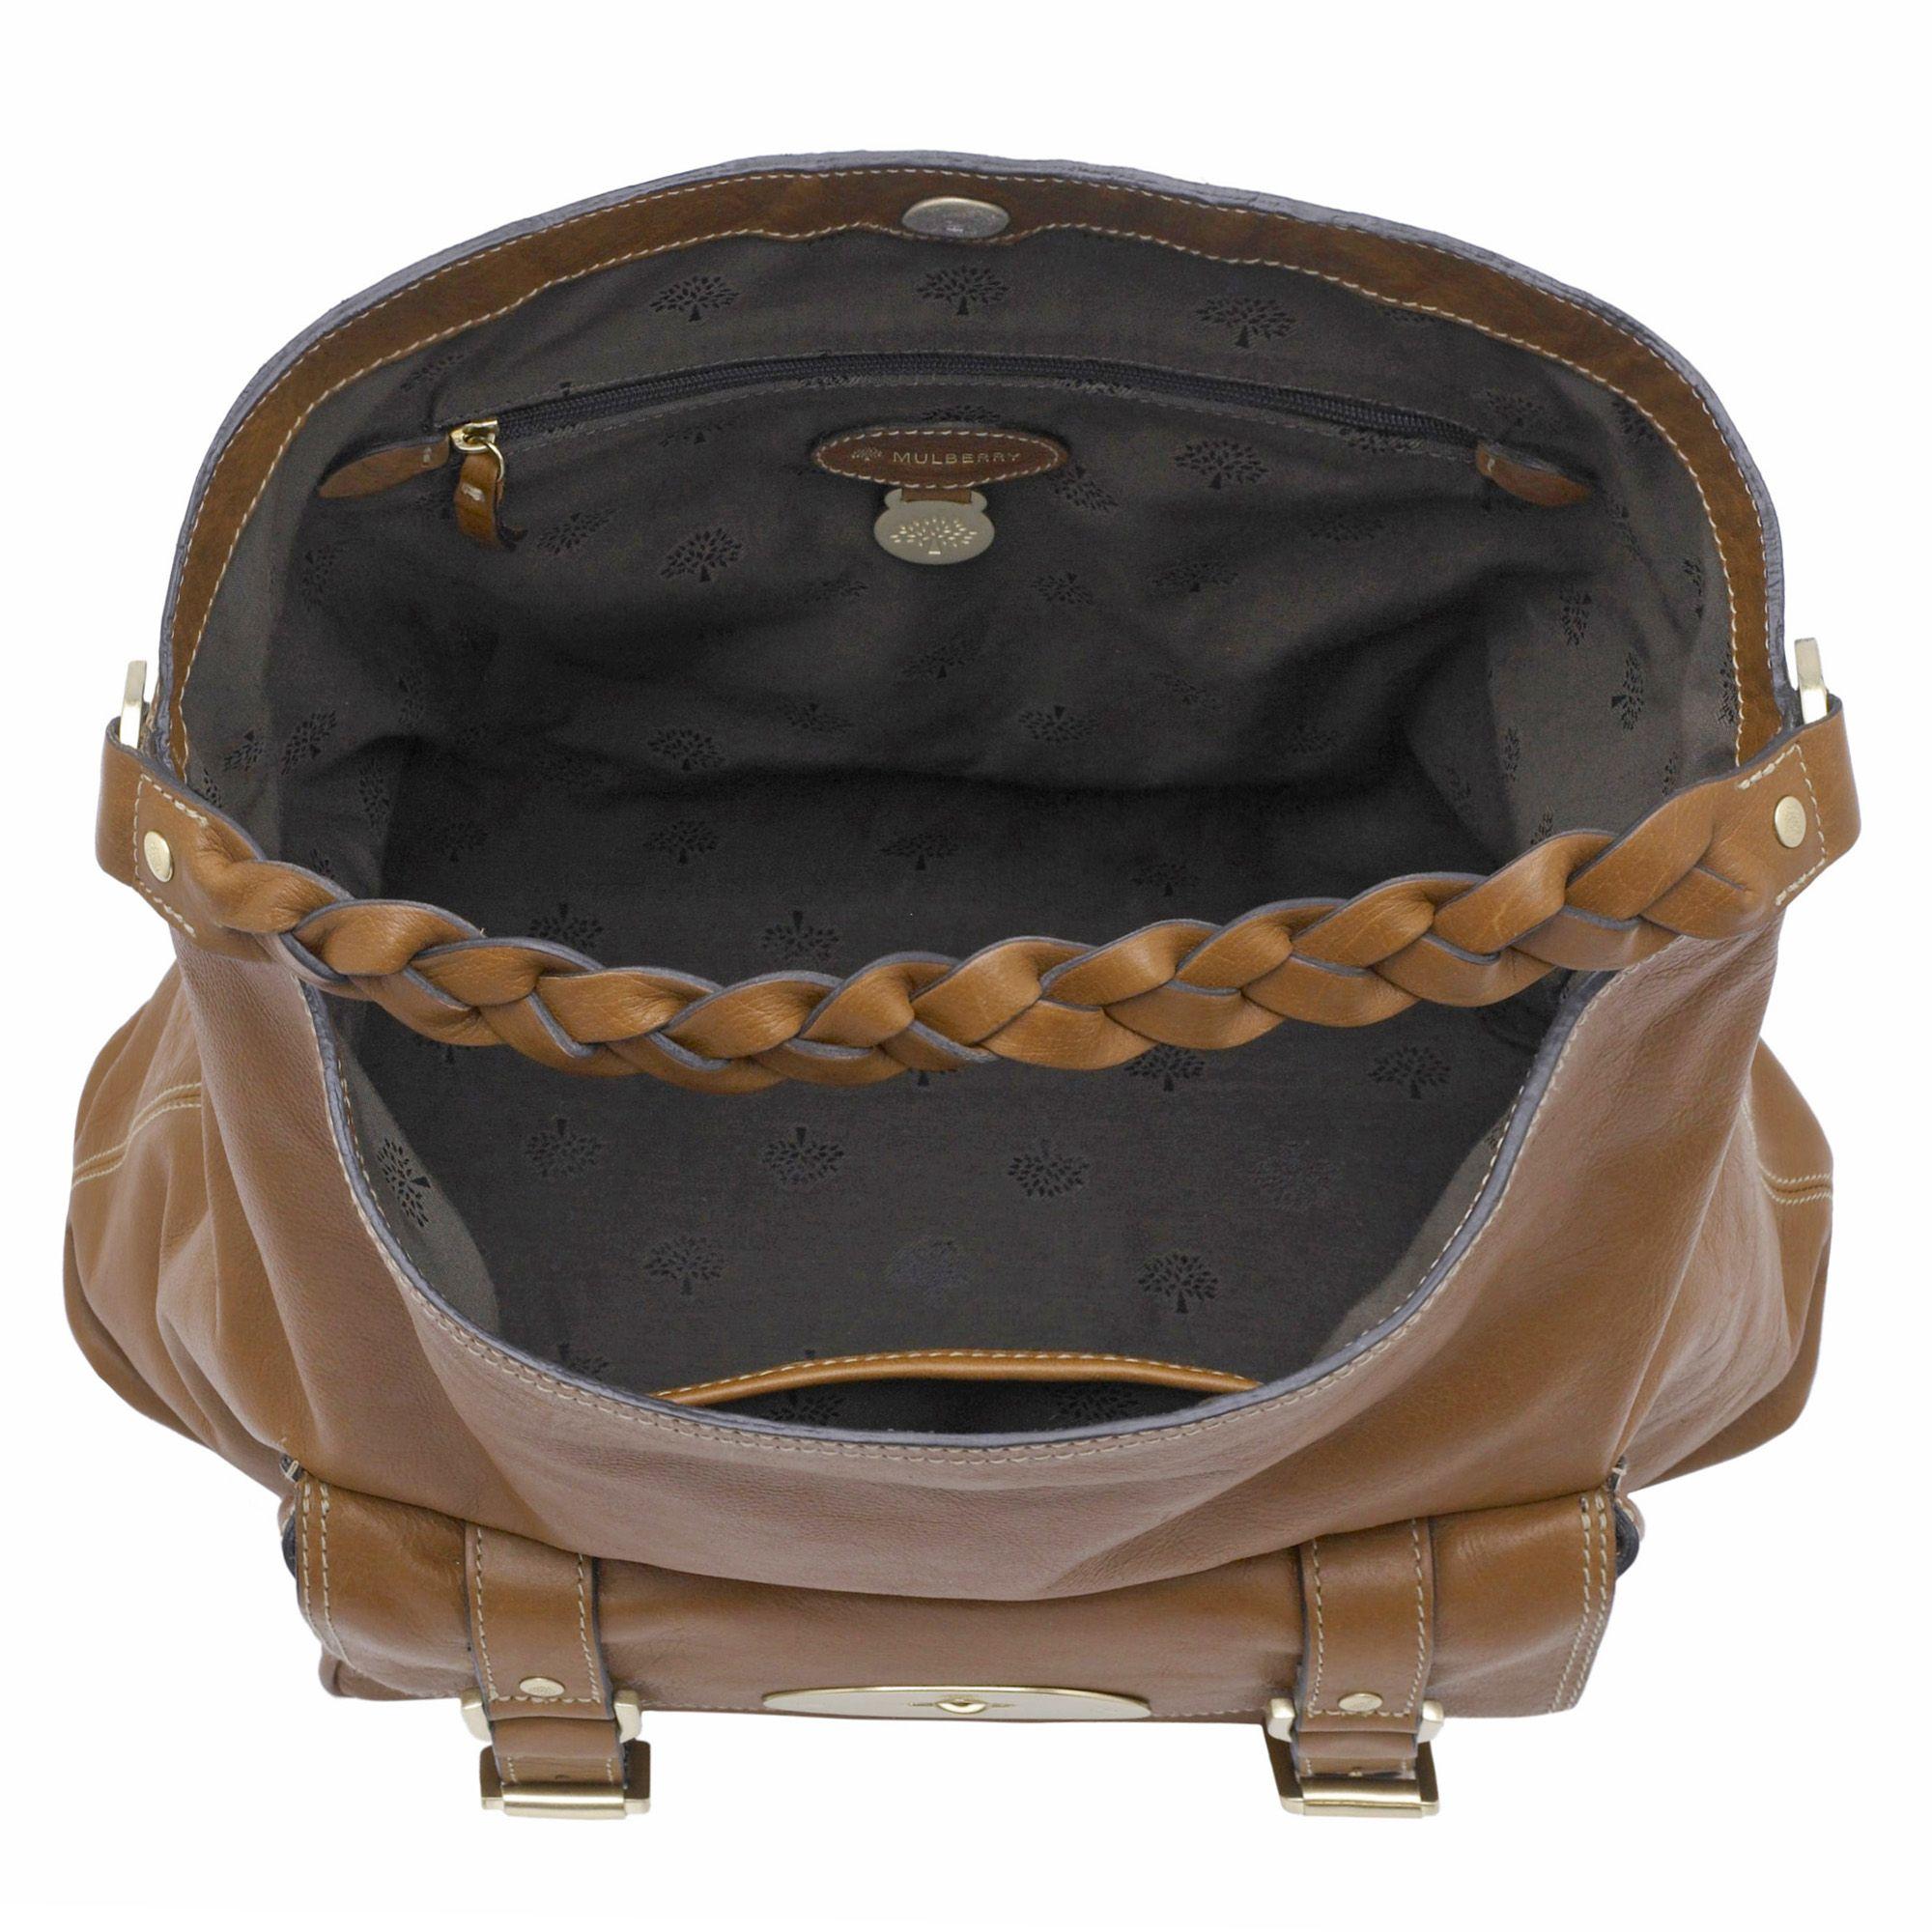 ... sweden mulberry alexa hobo bag in brown lyst 9430d d2128 9ea1bc82ff994